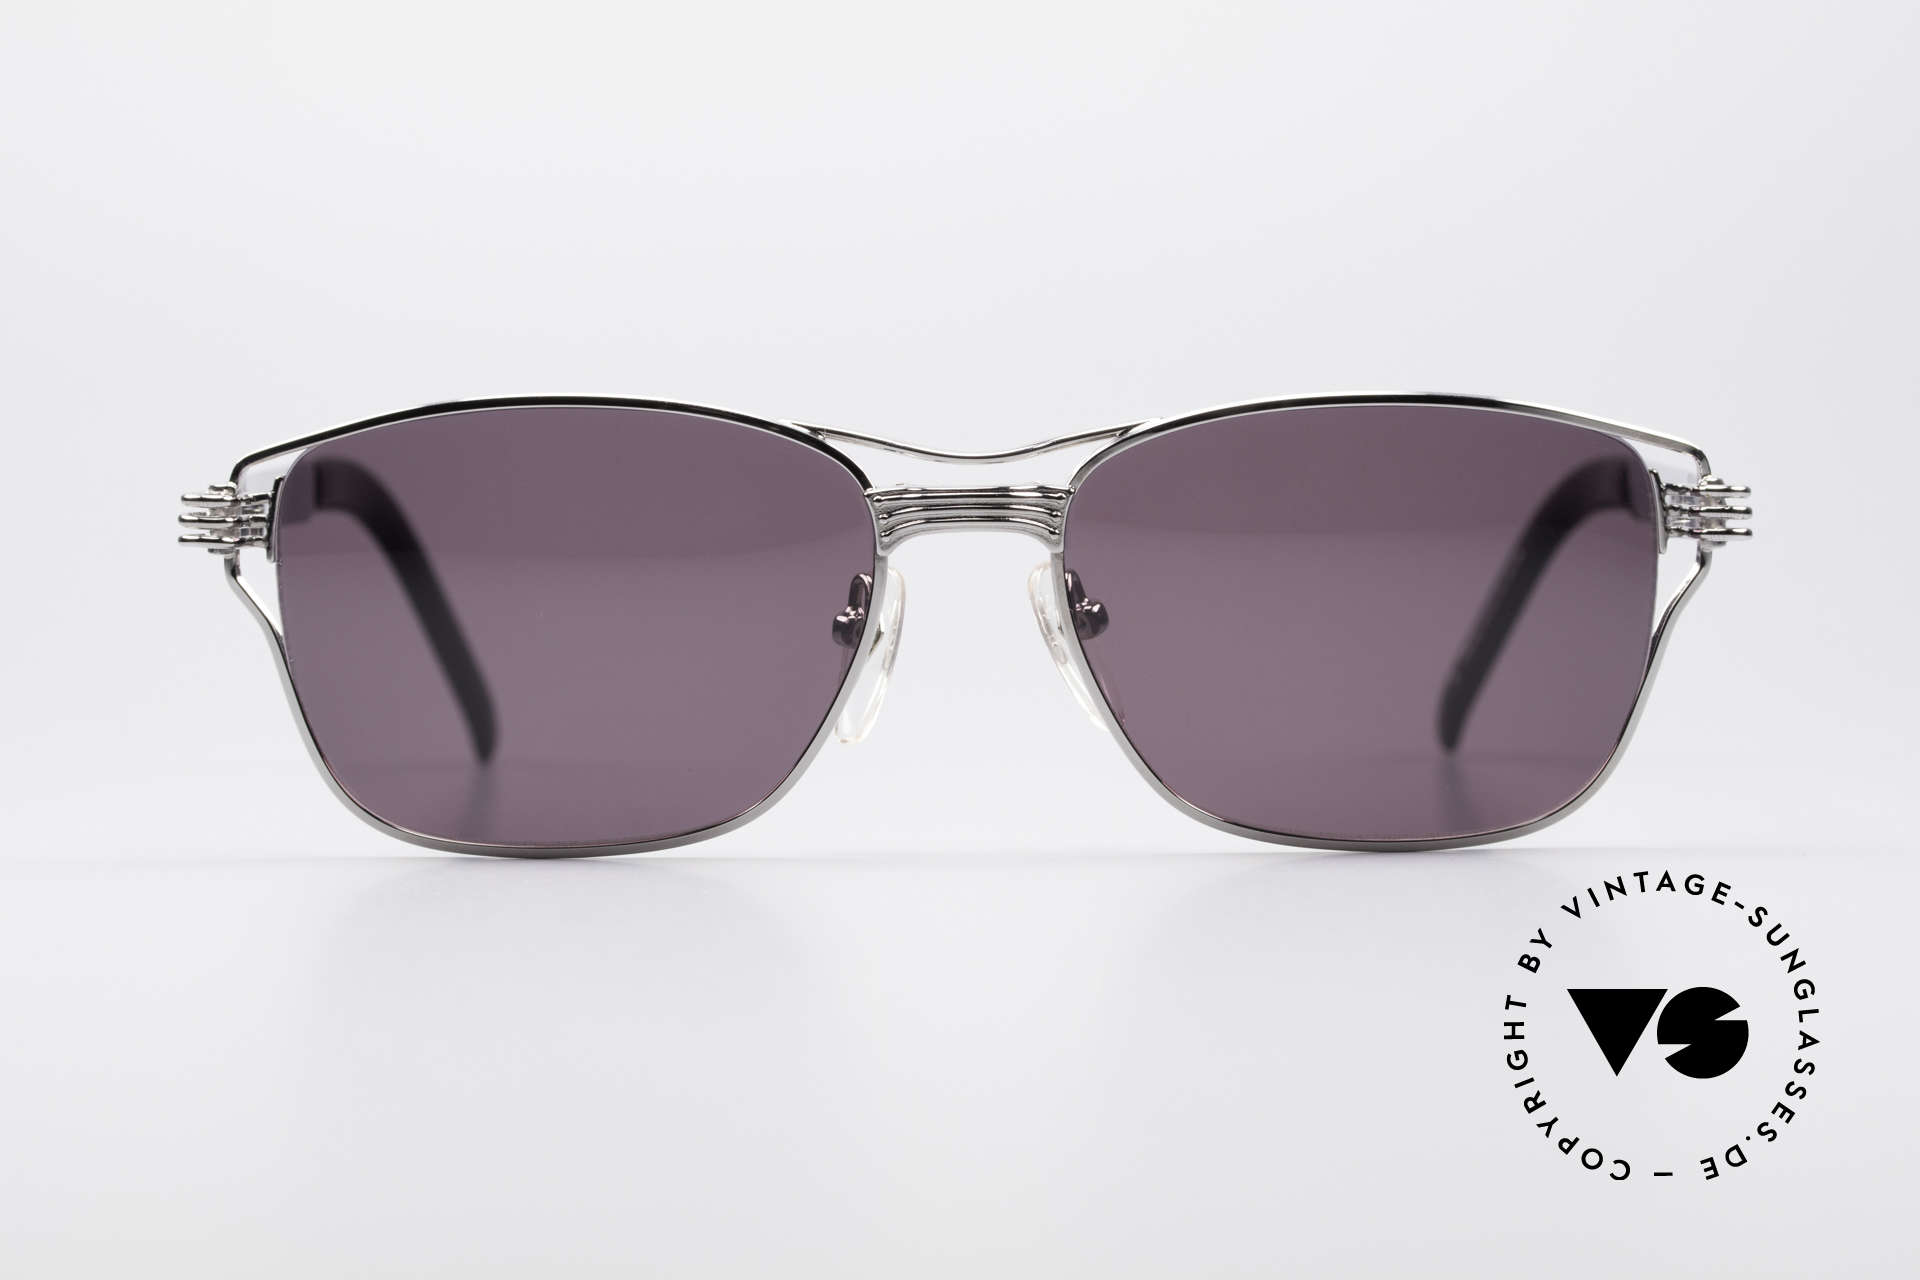 853d1db7f Sunglasses Jean Paul Gaultier 56-4173 Striking Square Sunglasses ...